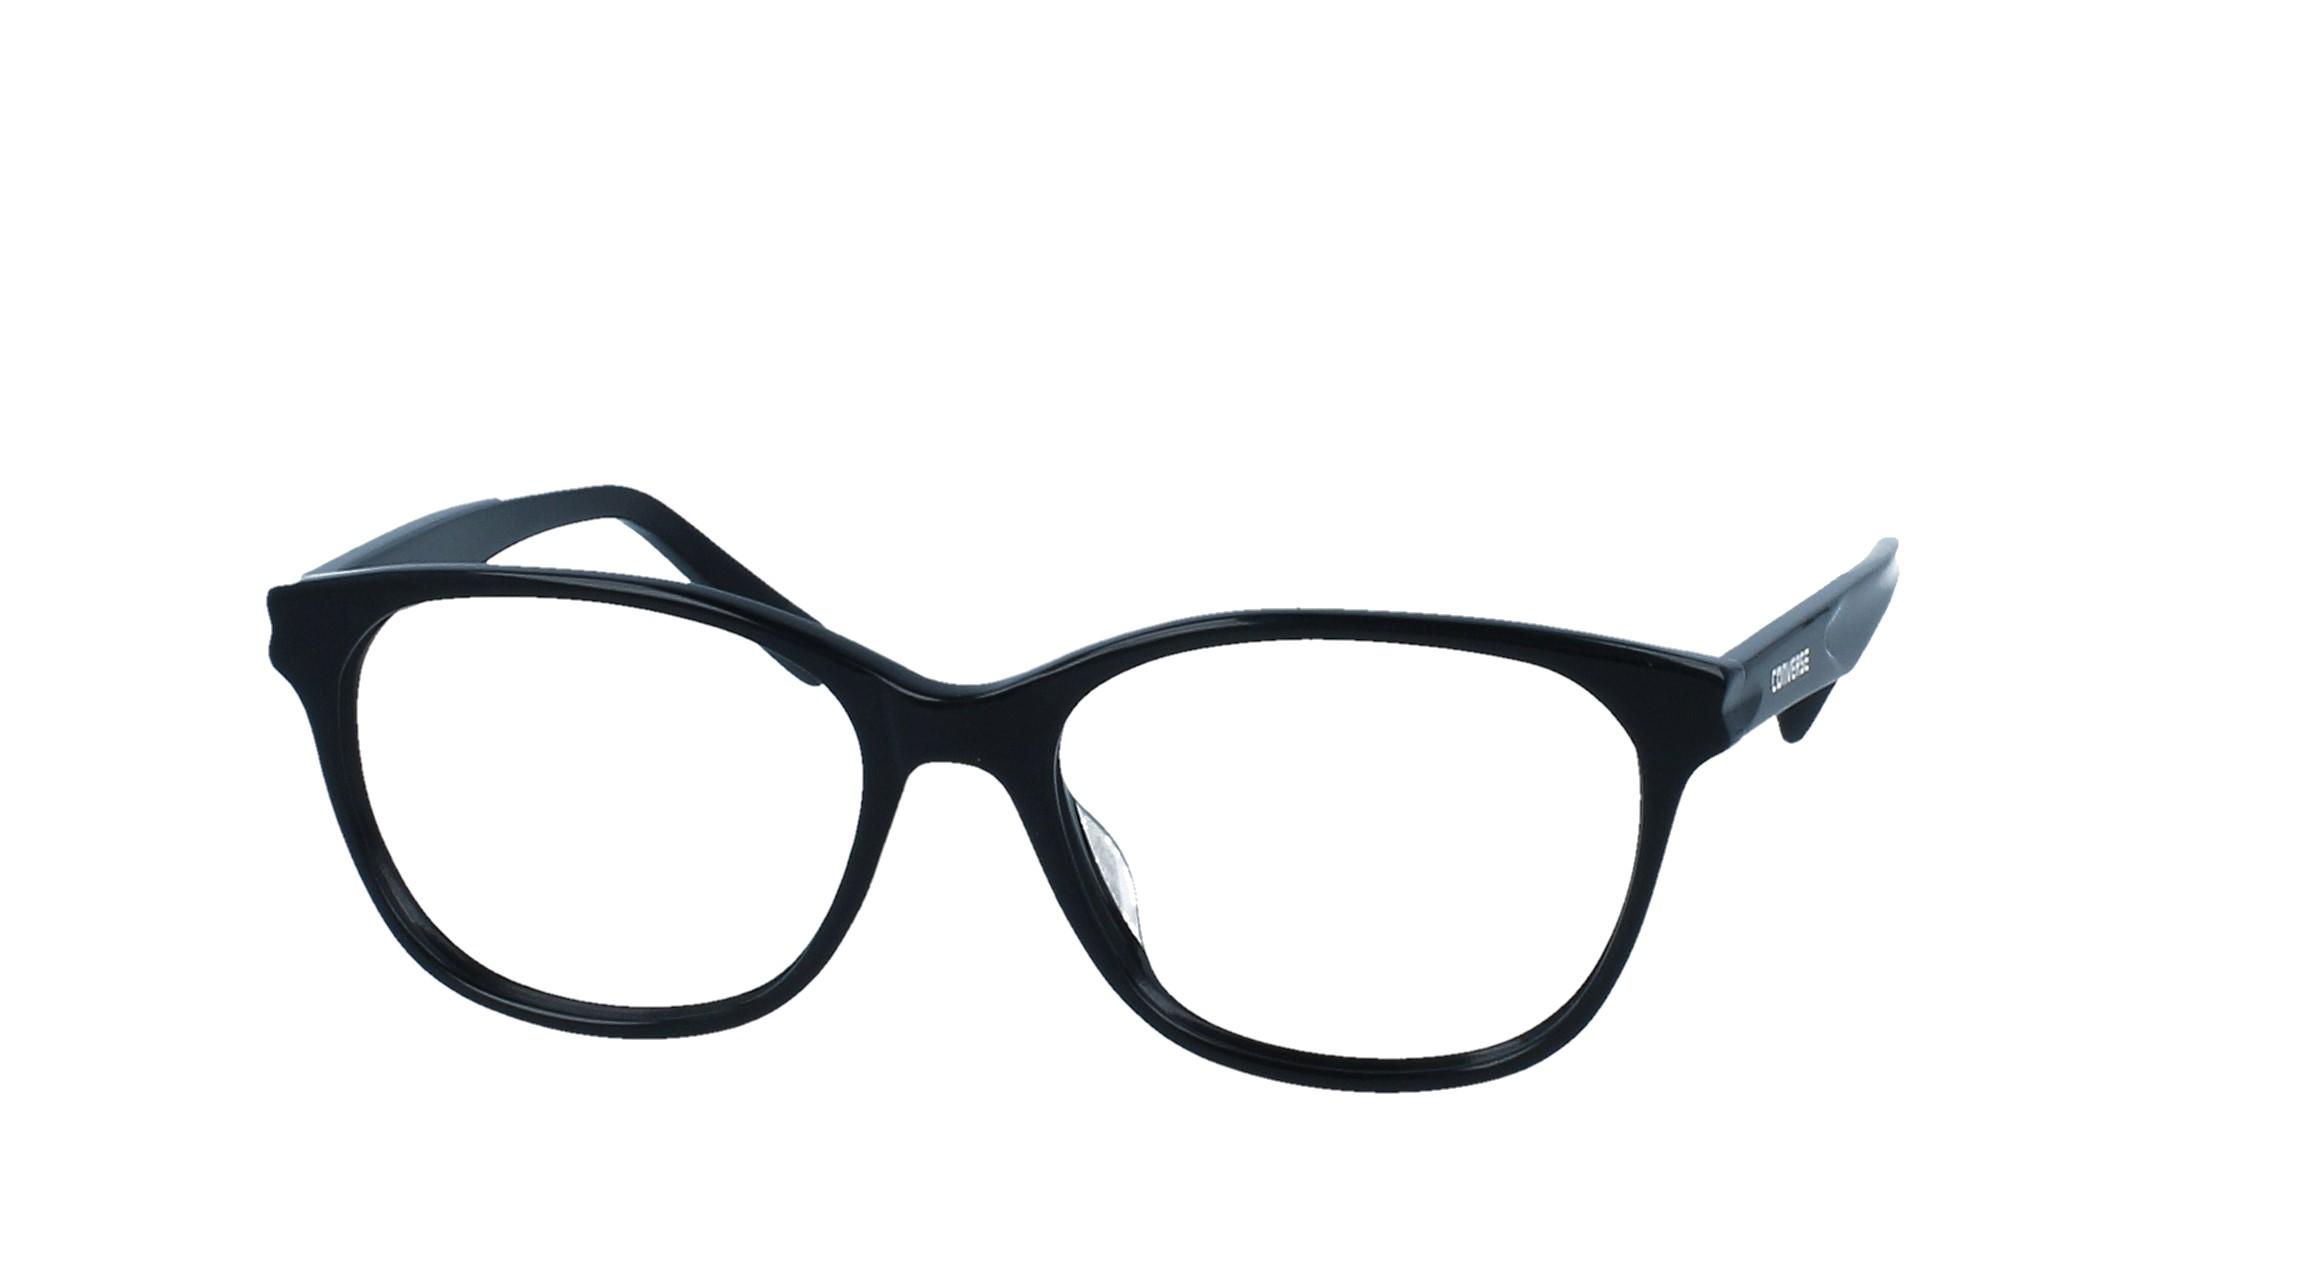 f7e2e4d52f8f67 Converse 105A Black - Ladies Prescription Frames - Spec-Savers South ...